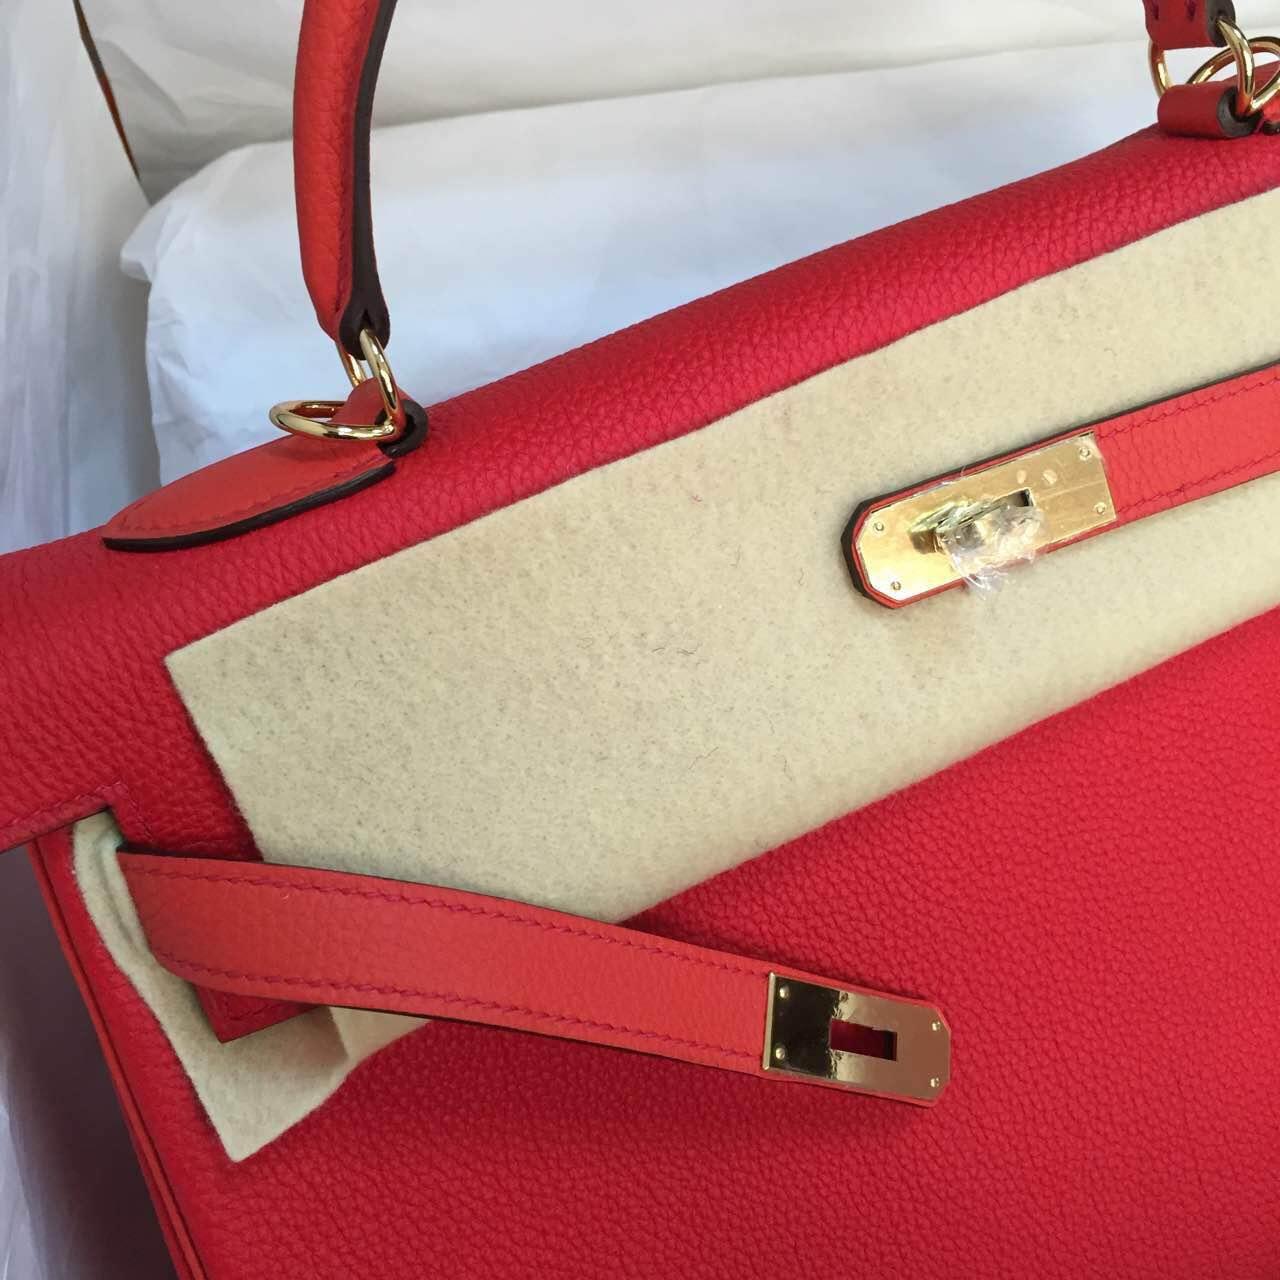 Cheap Hermes Kelly Bag35cm Retourne Q5 Candy Red & 9T Flame Red Togo Calfskin Leather Handbag